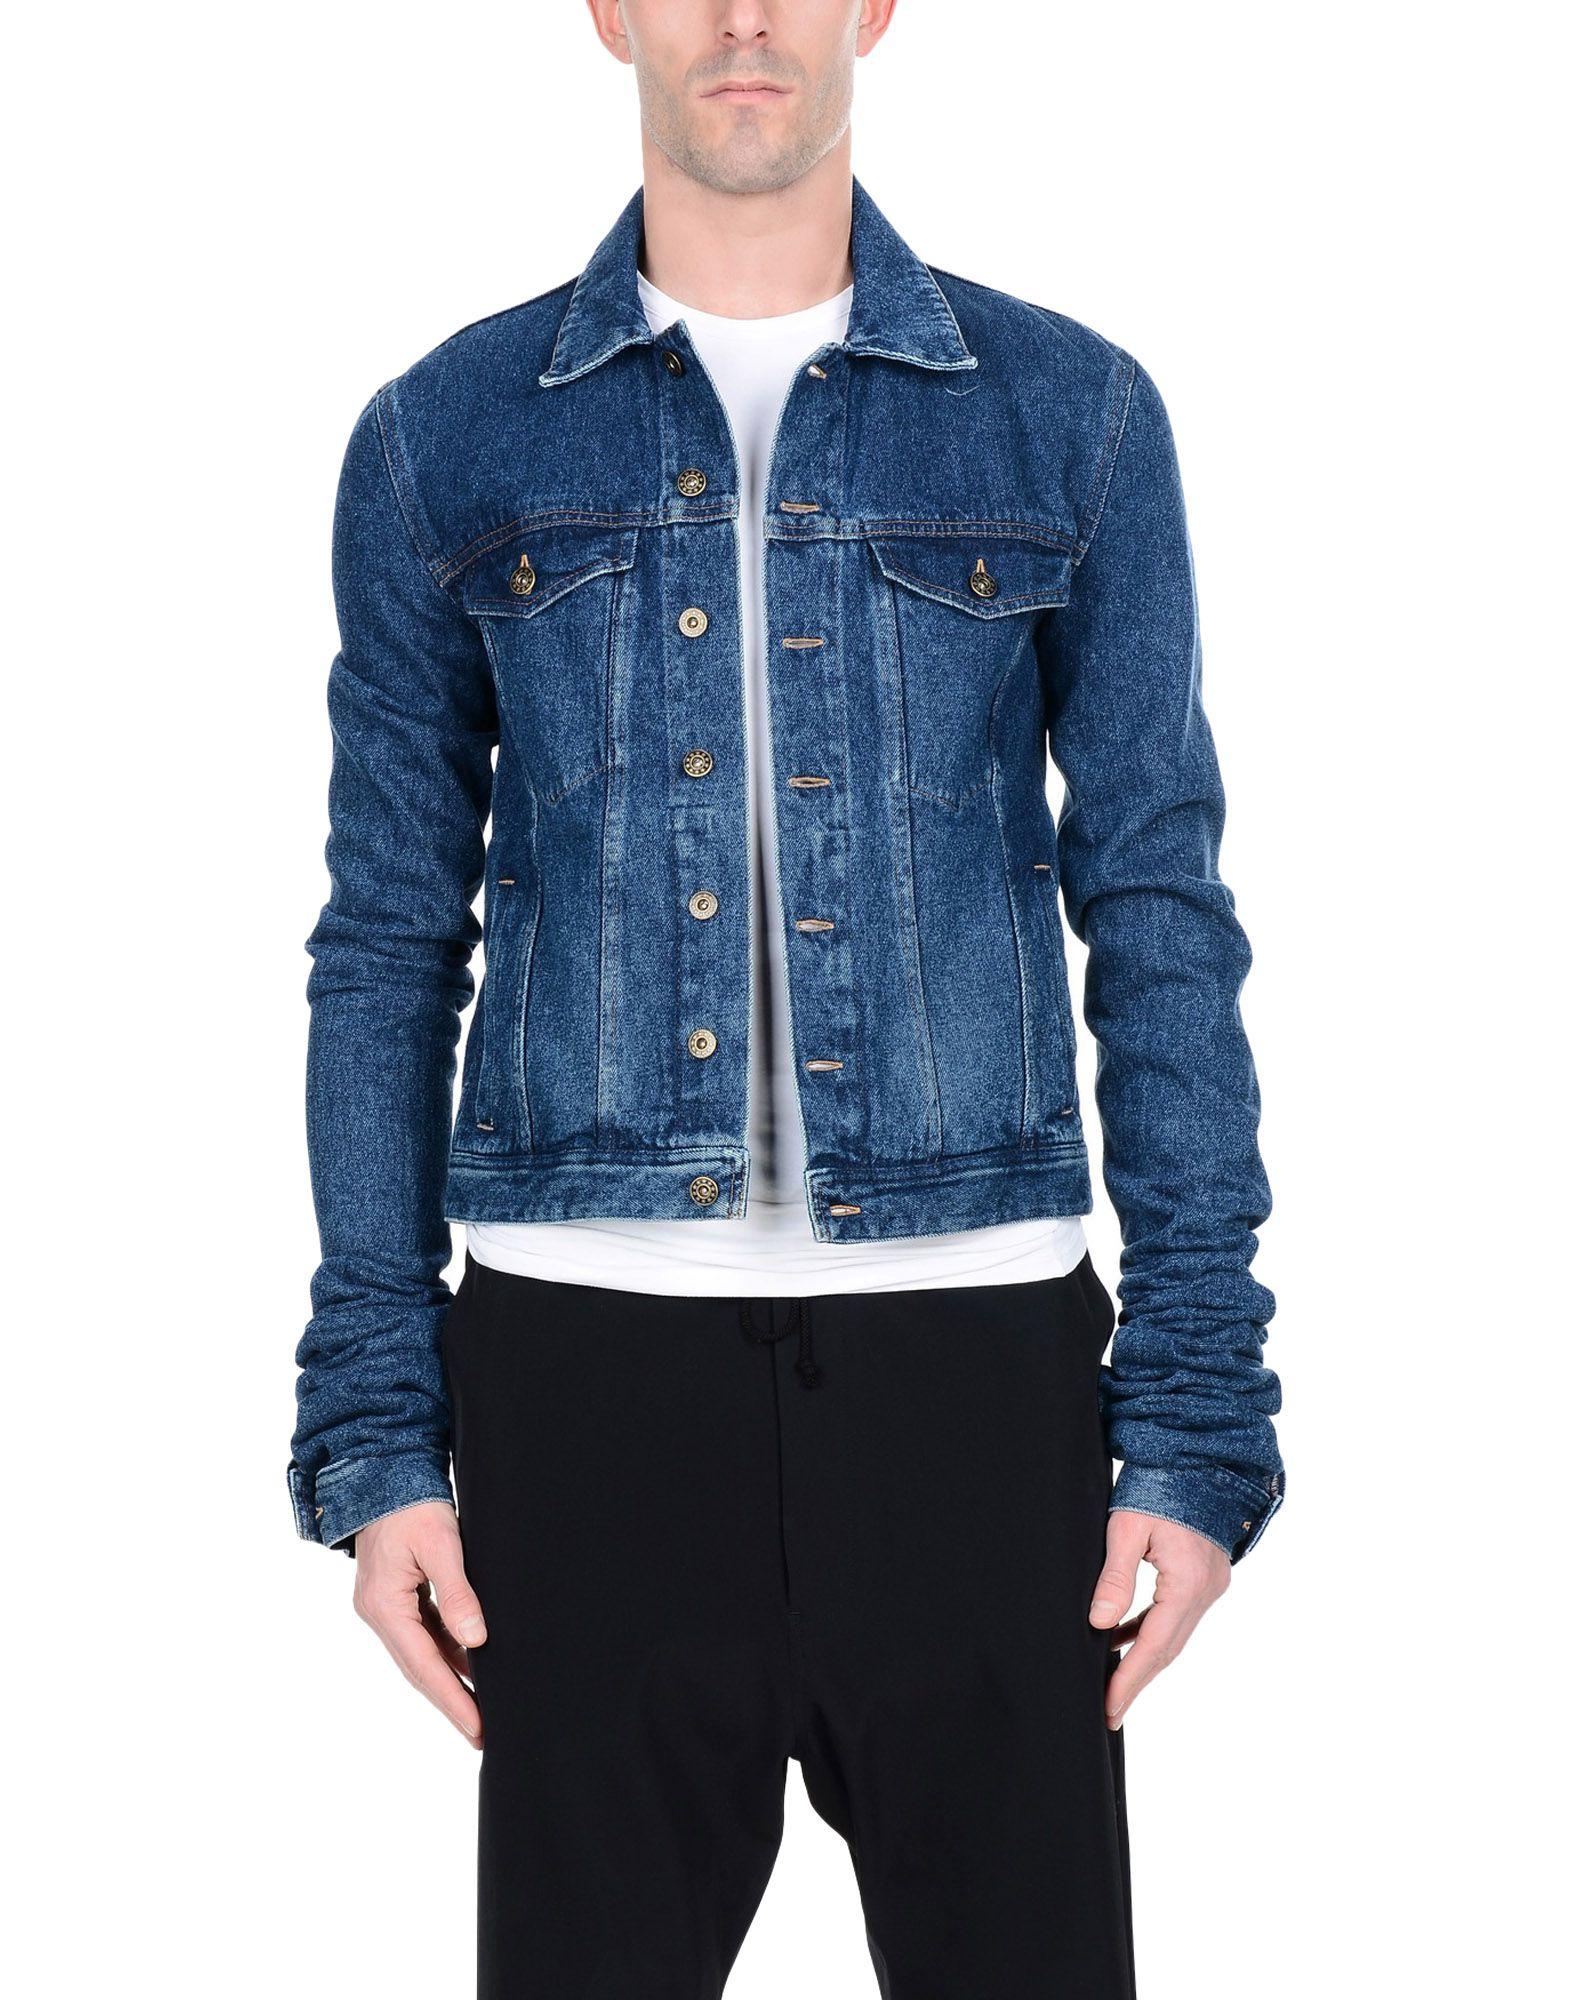 Y PROJECT Джинсовая верхняя одежда верхняя одежда